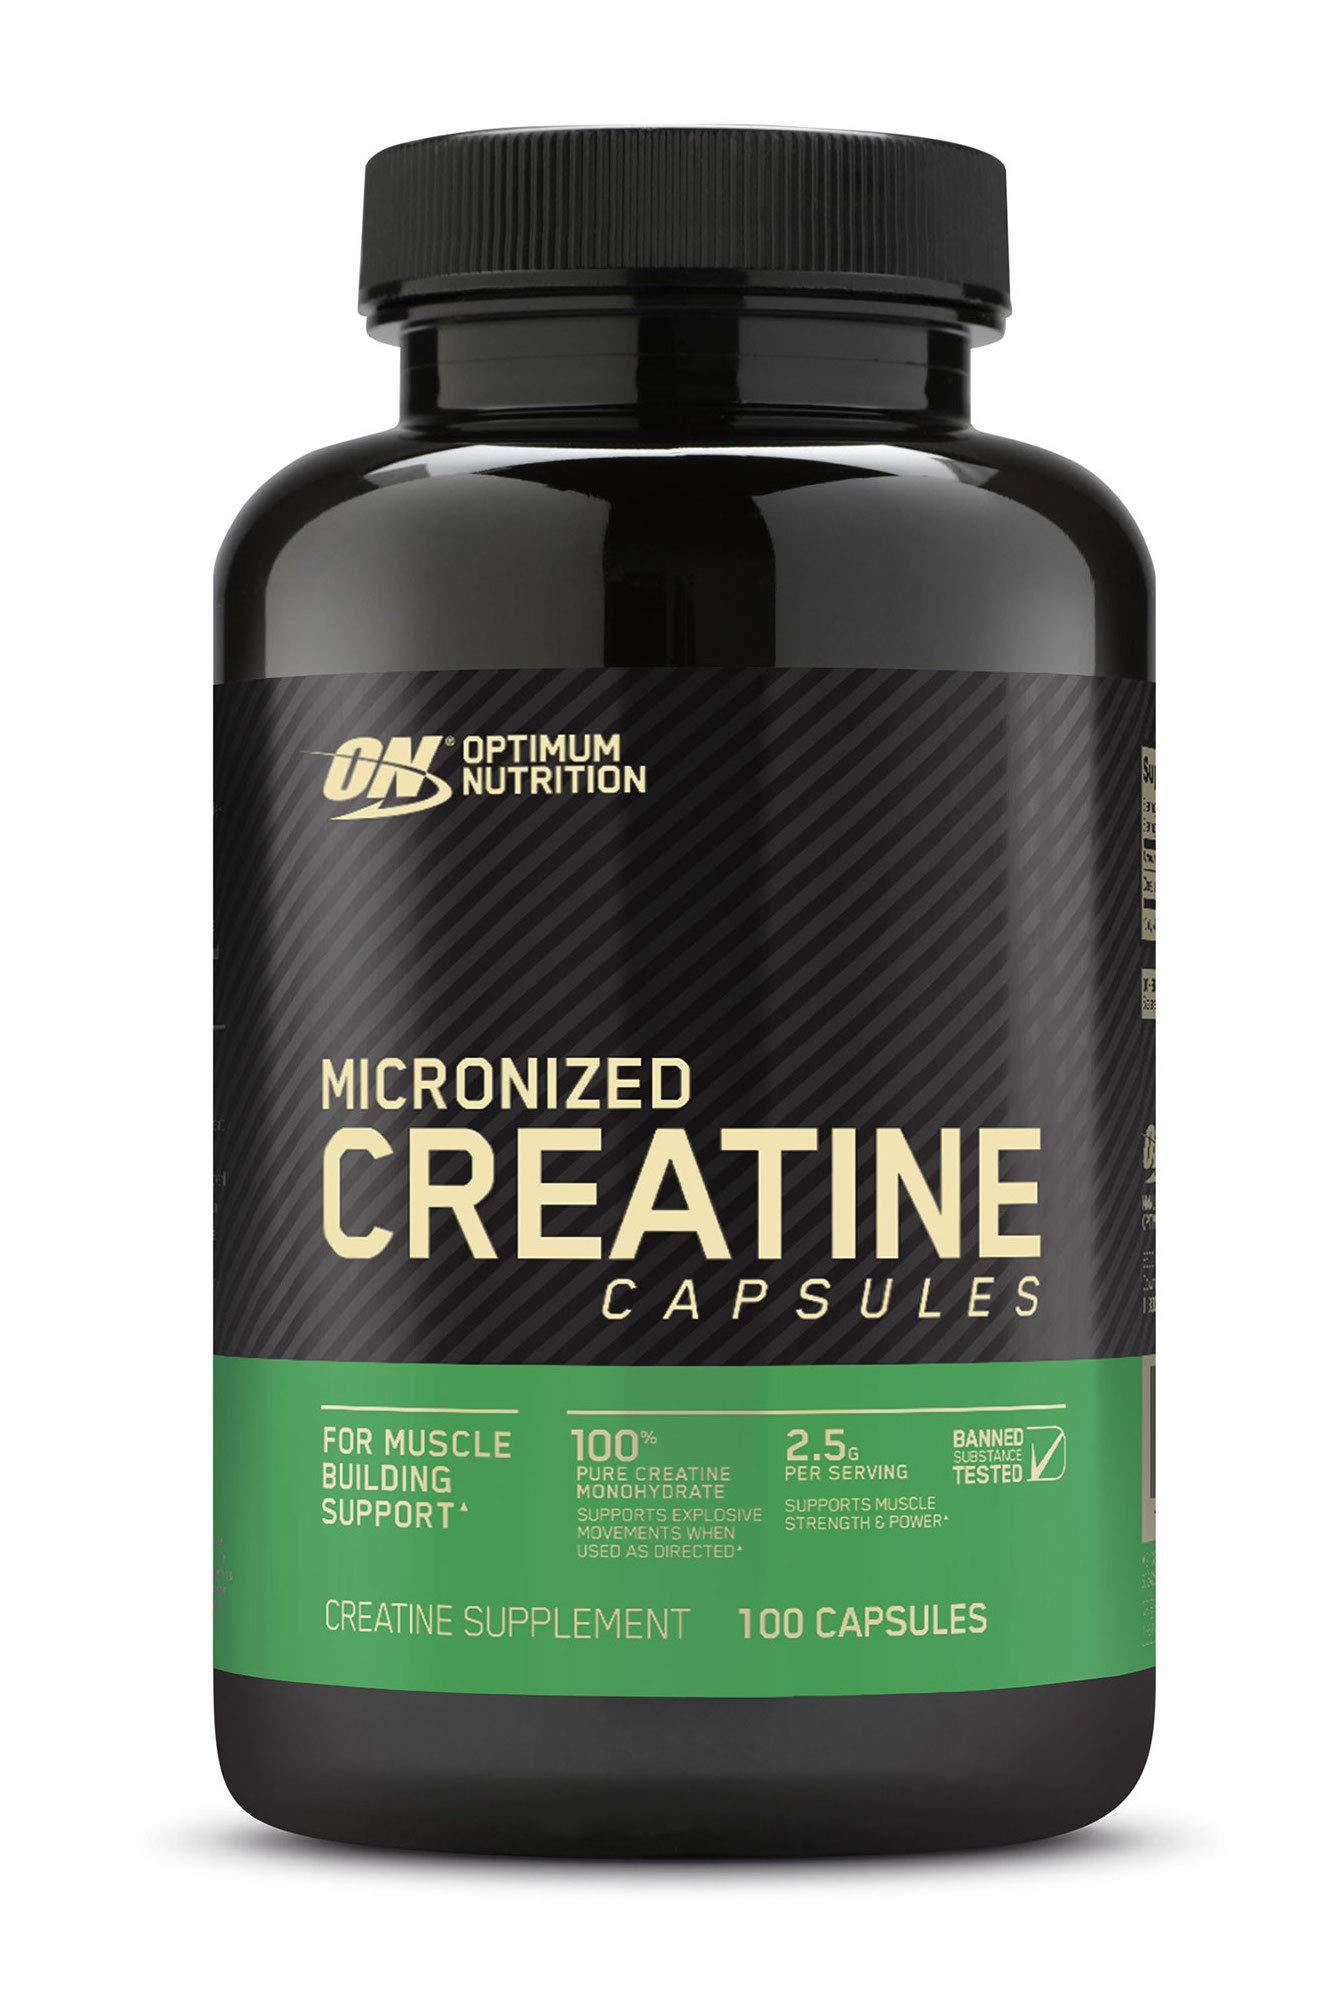 Optimum Nutrition Micronized Creatine Monohydrate Capsules